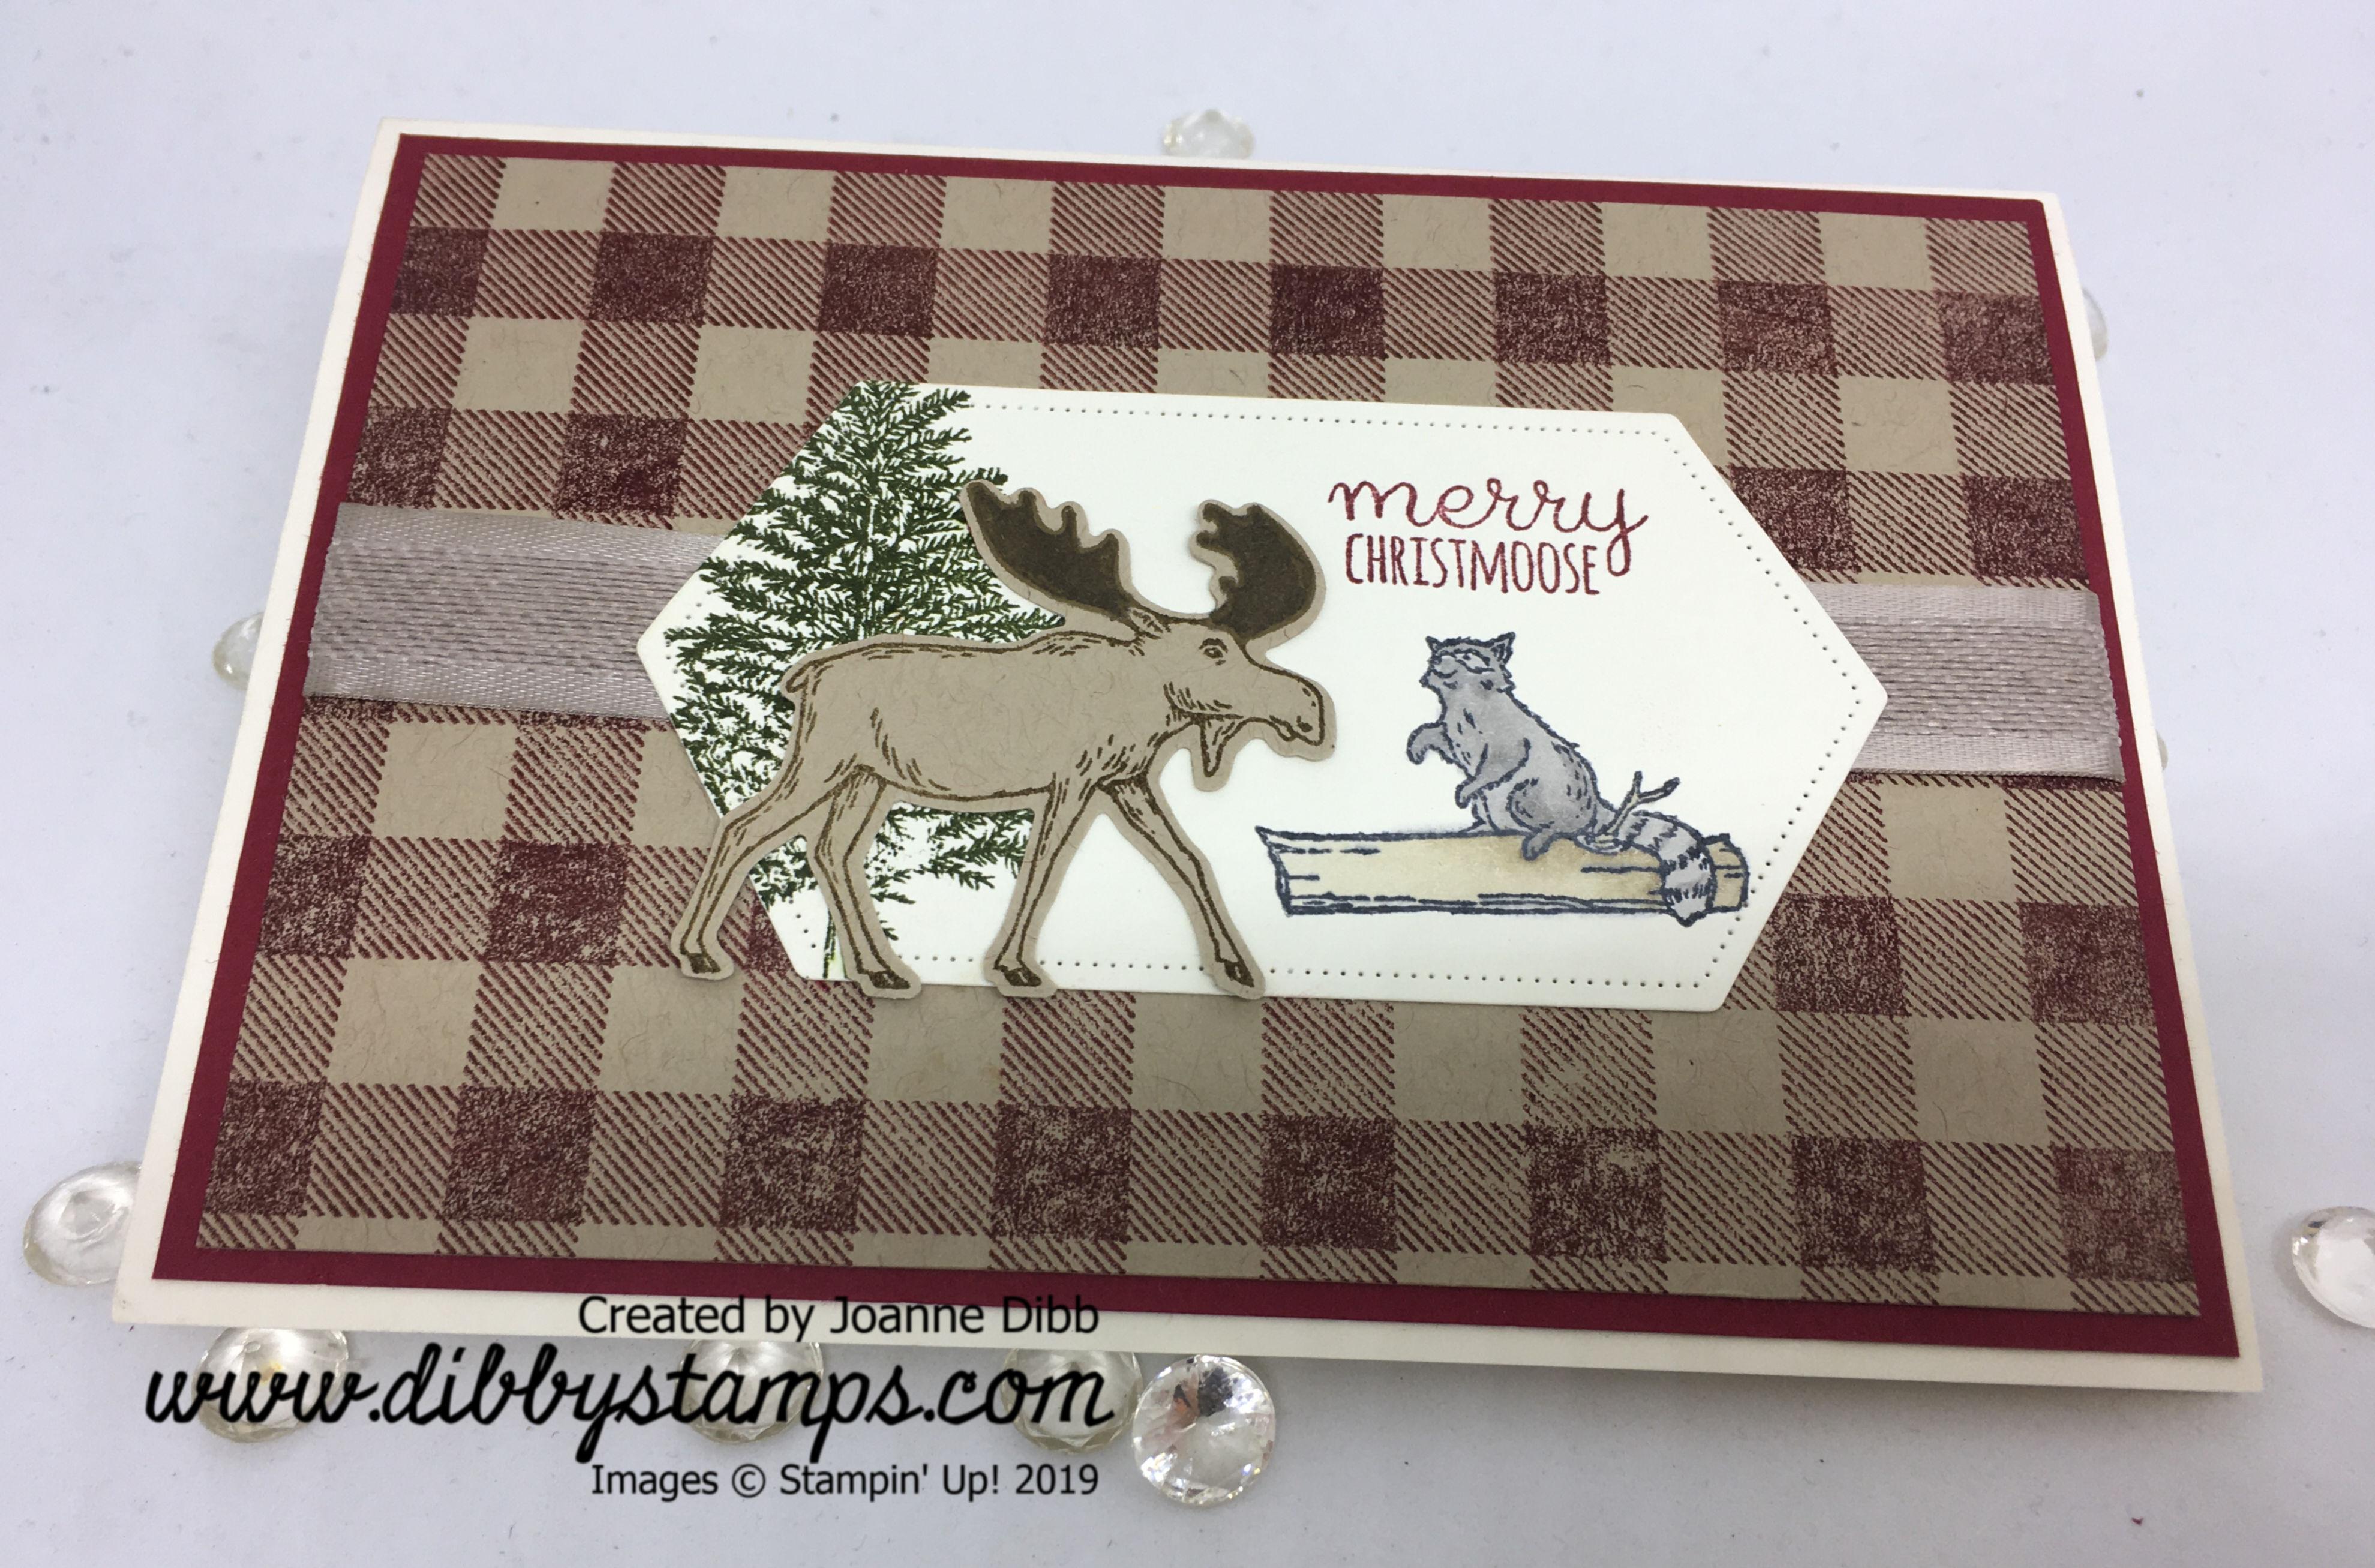 Merry Christmoose Card - flat